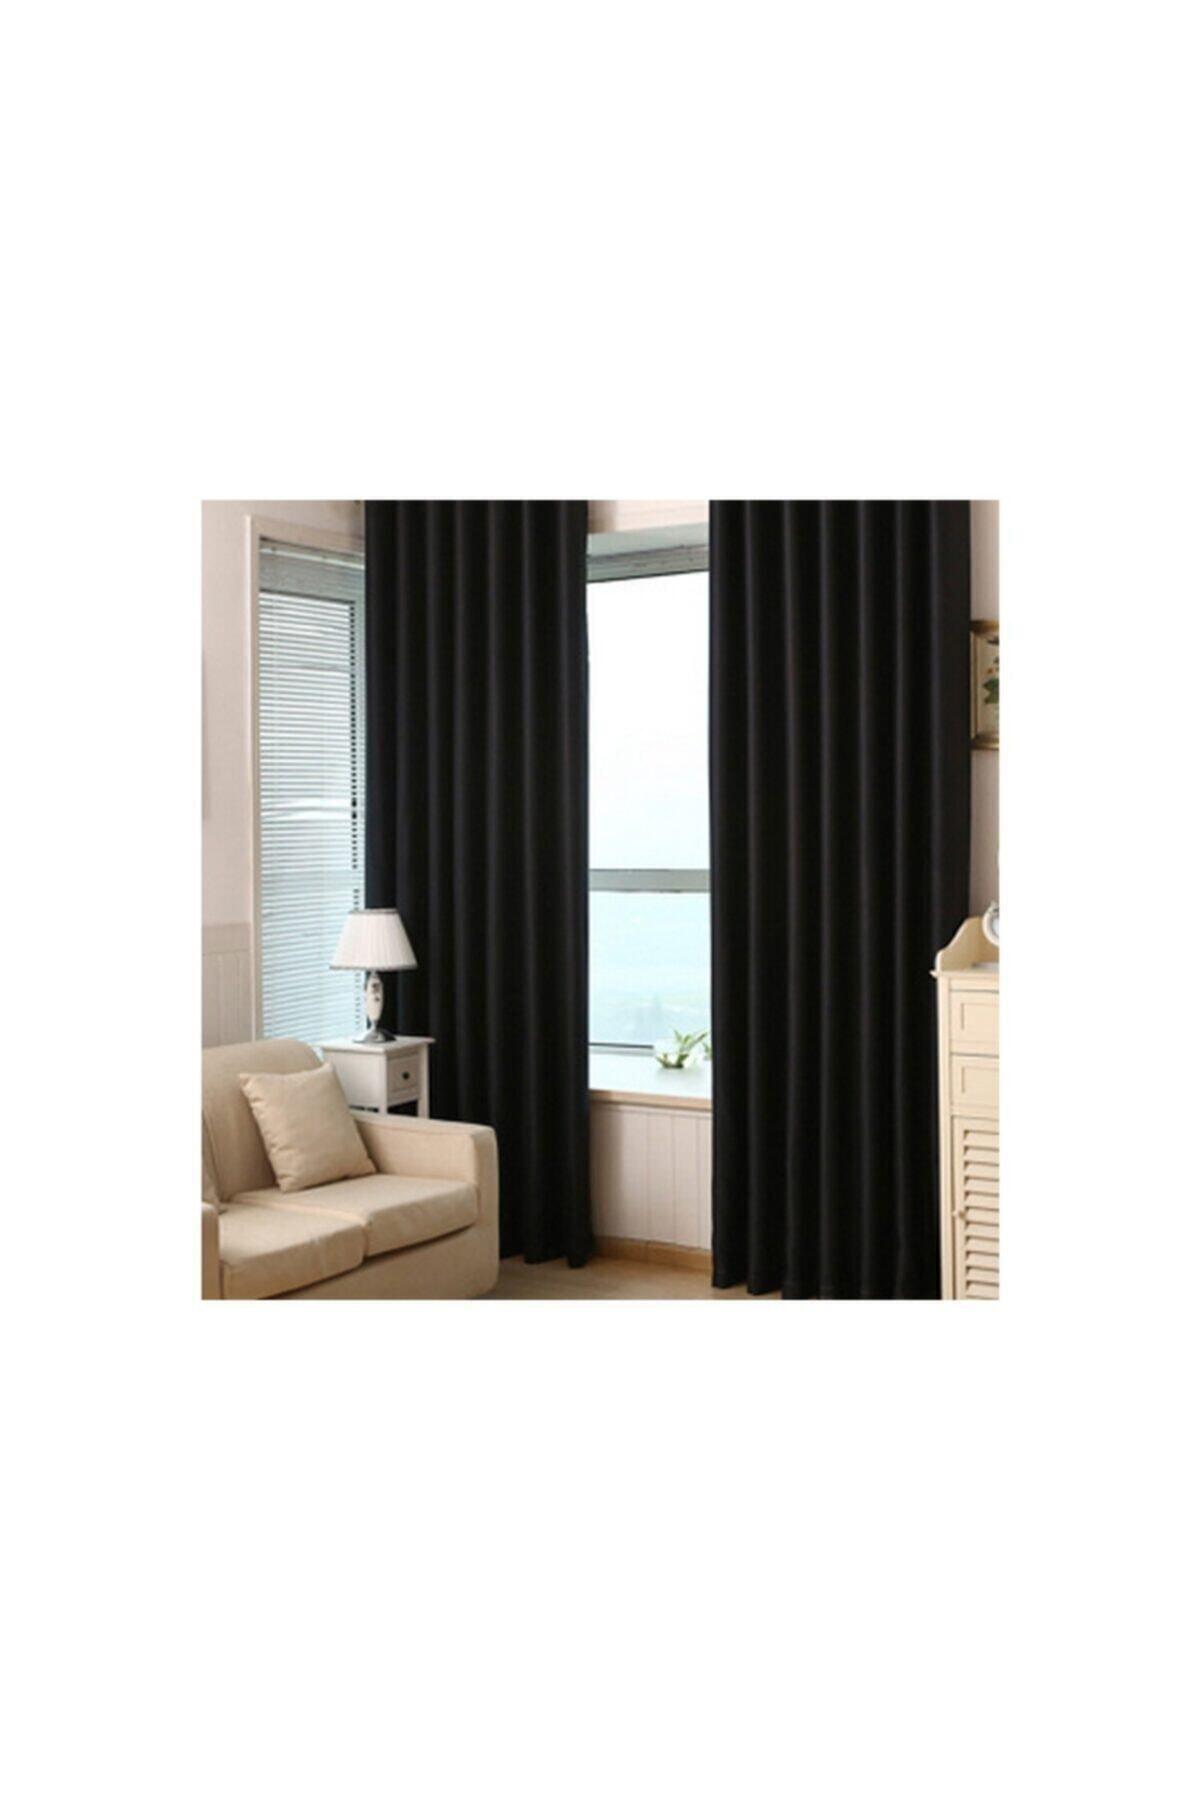 Brillant Blackout Karartma Güneşlik Perde Pilesiz Siyah Lcrblck 100x200 1